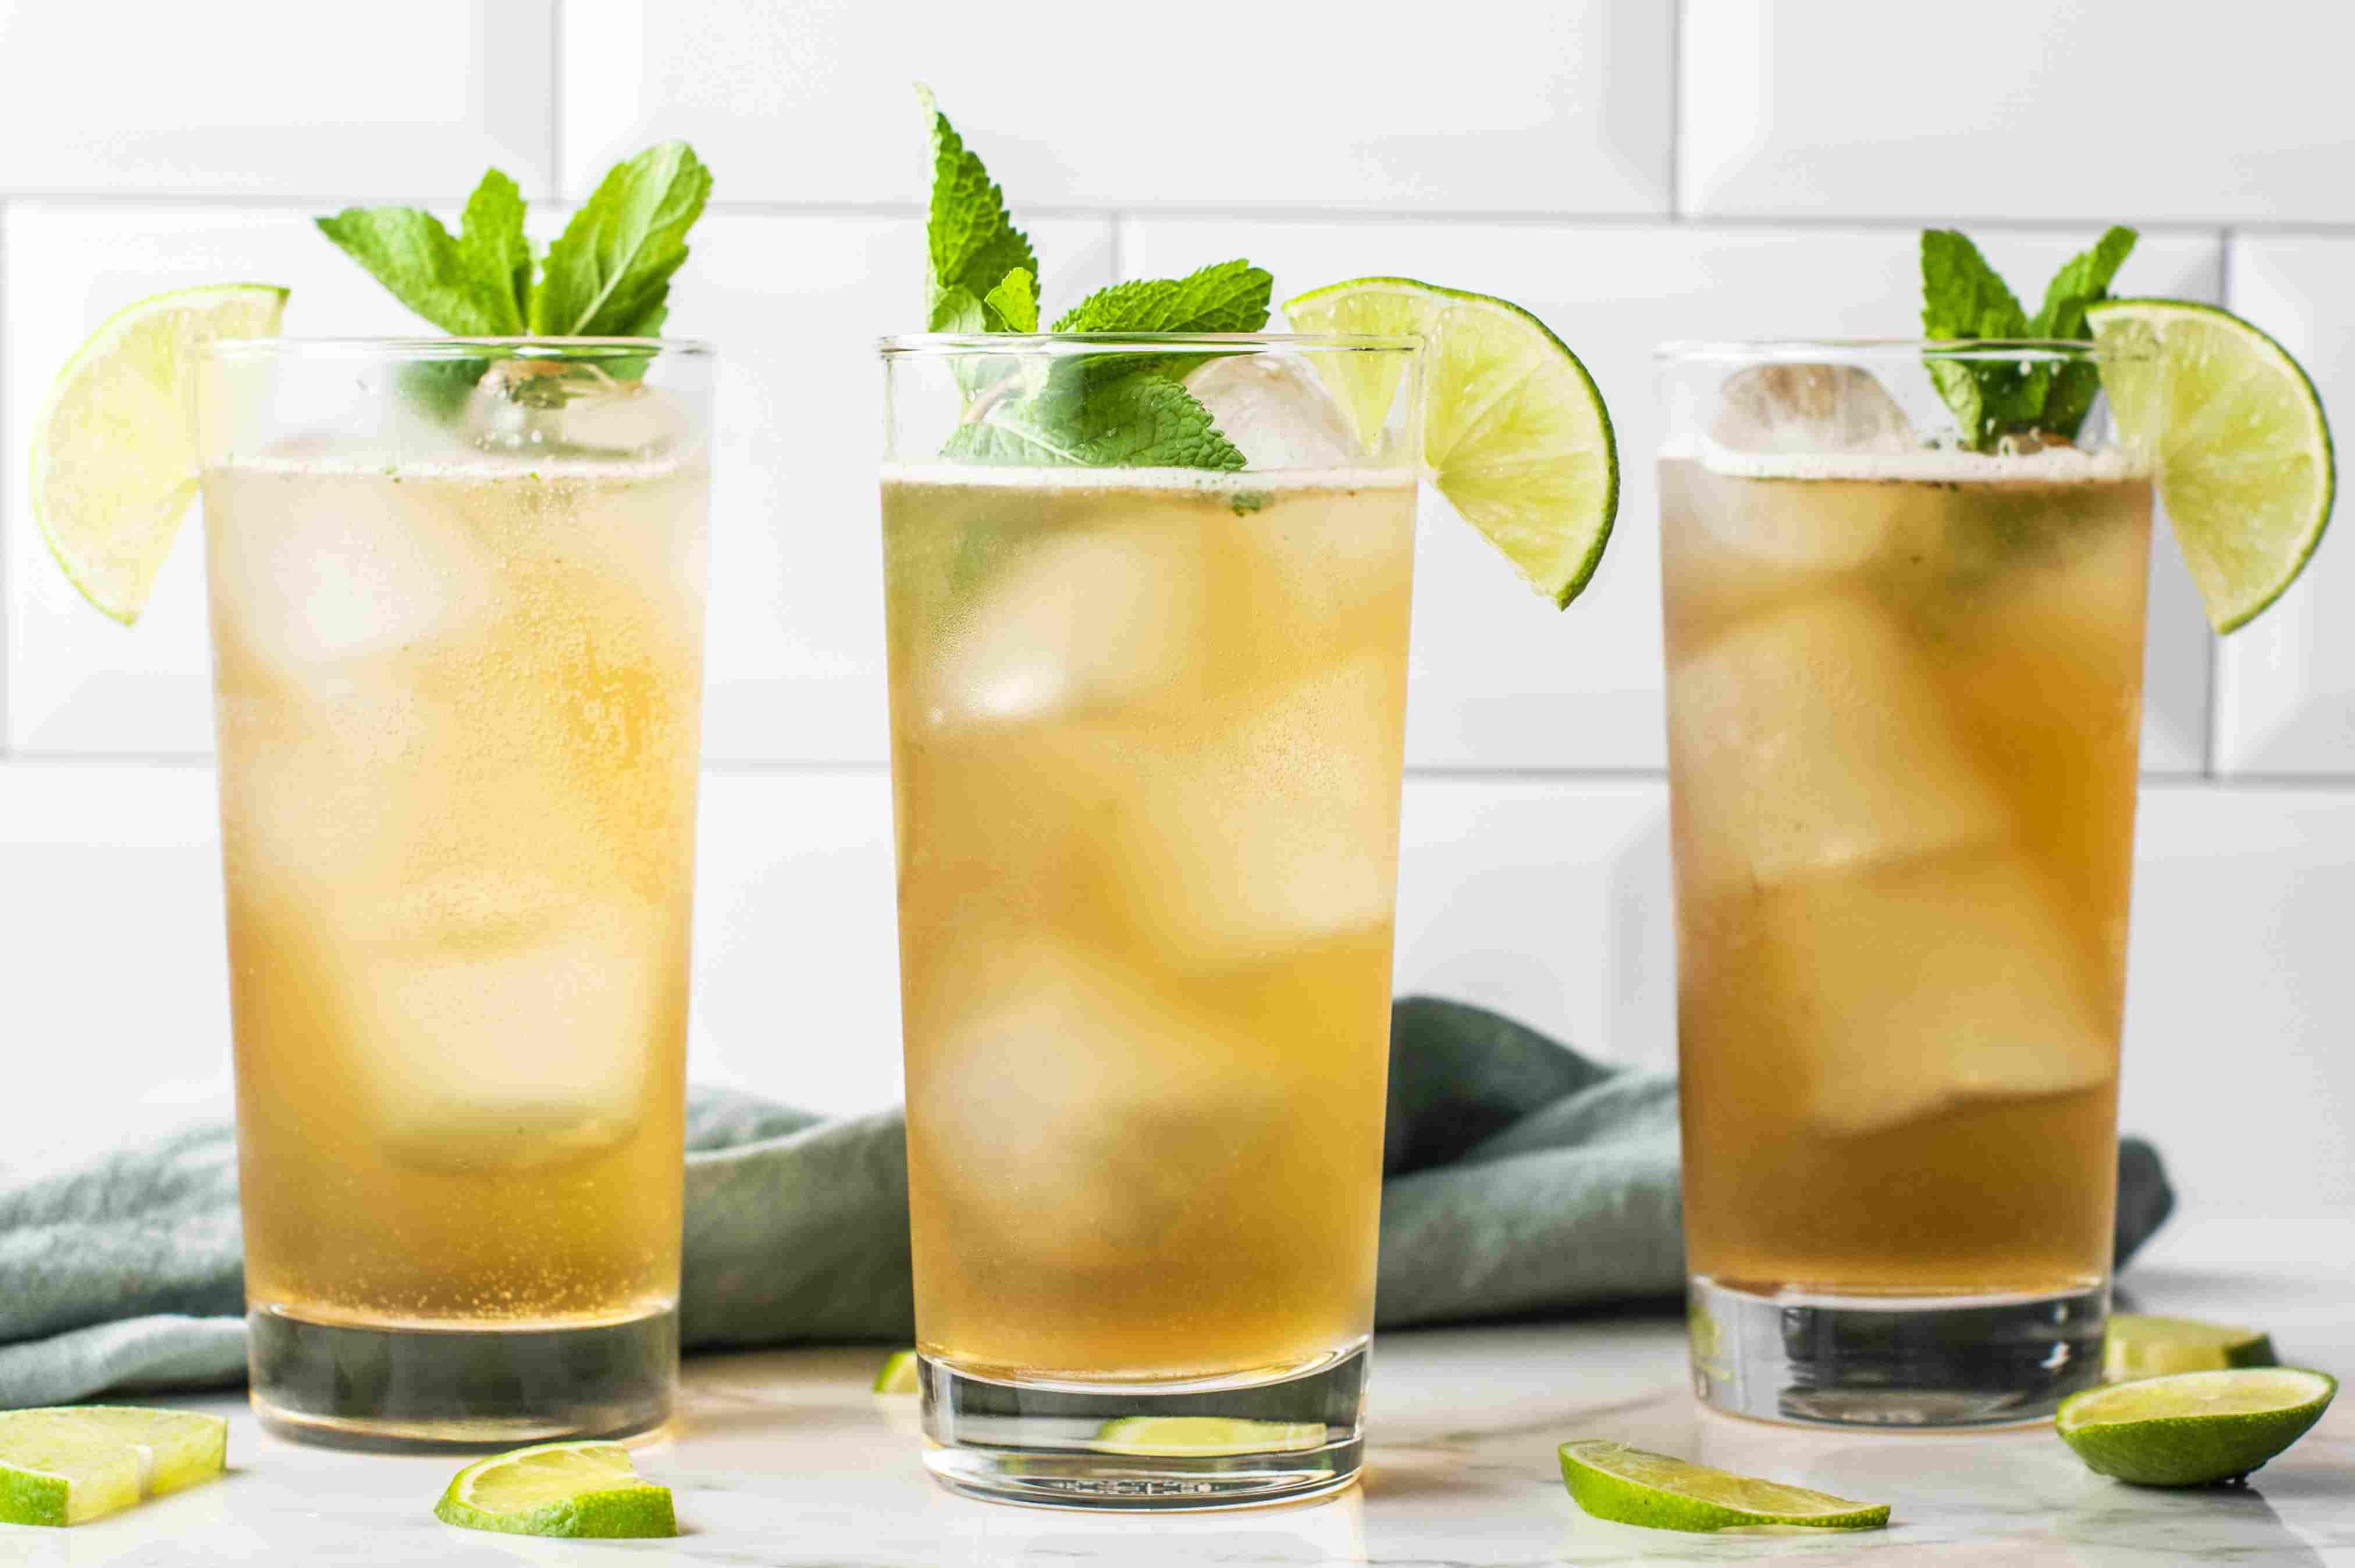 gin_gin_mule_coctail.jpg